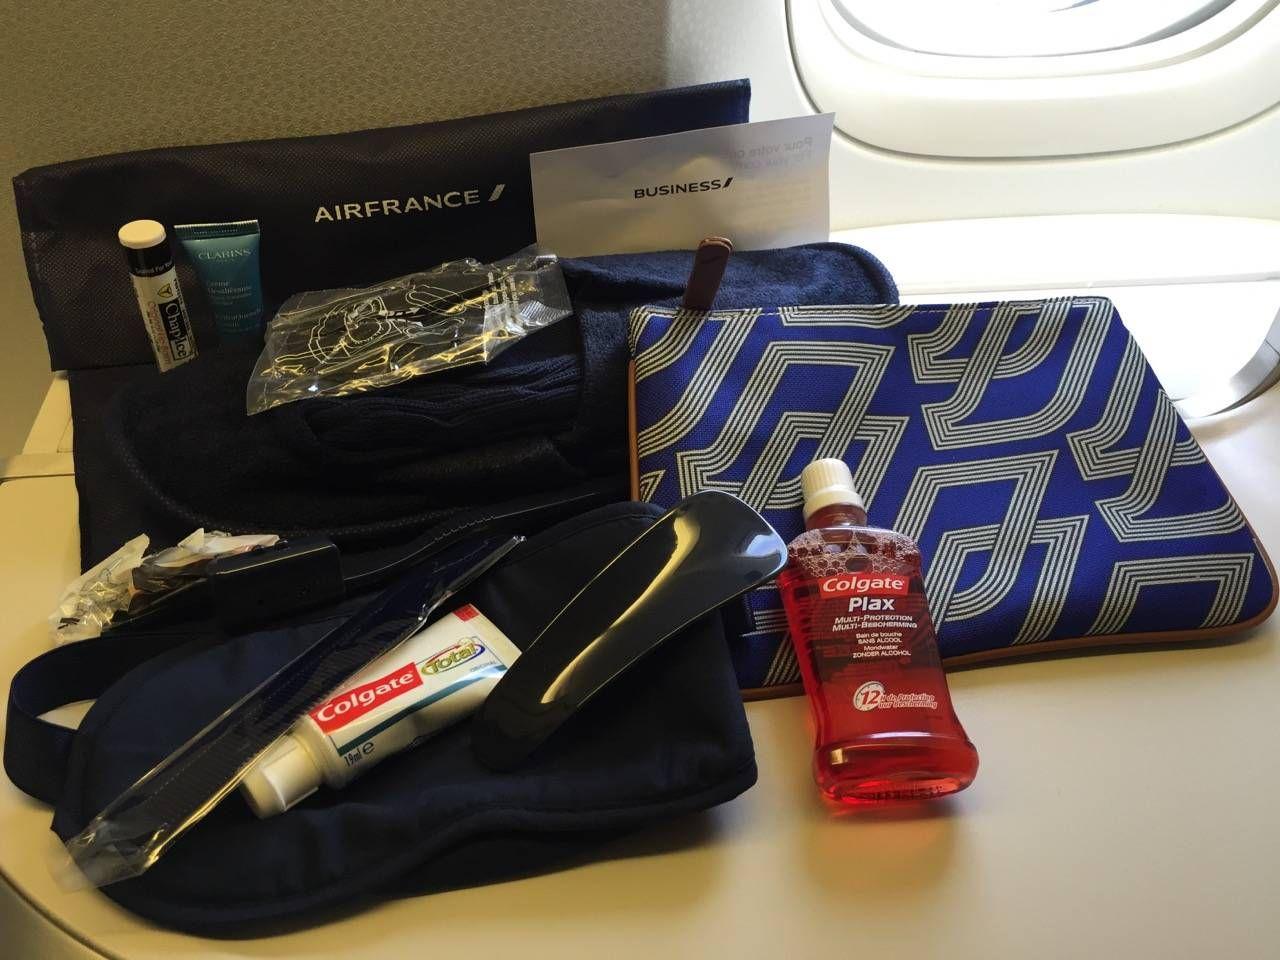 Air France New Business Class-020